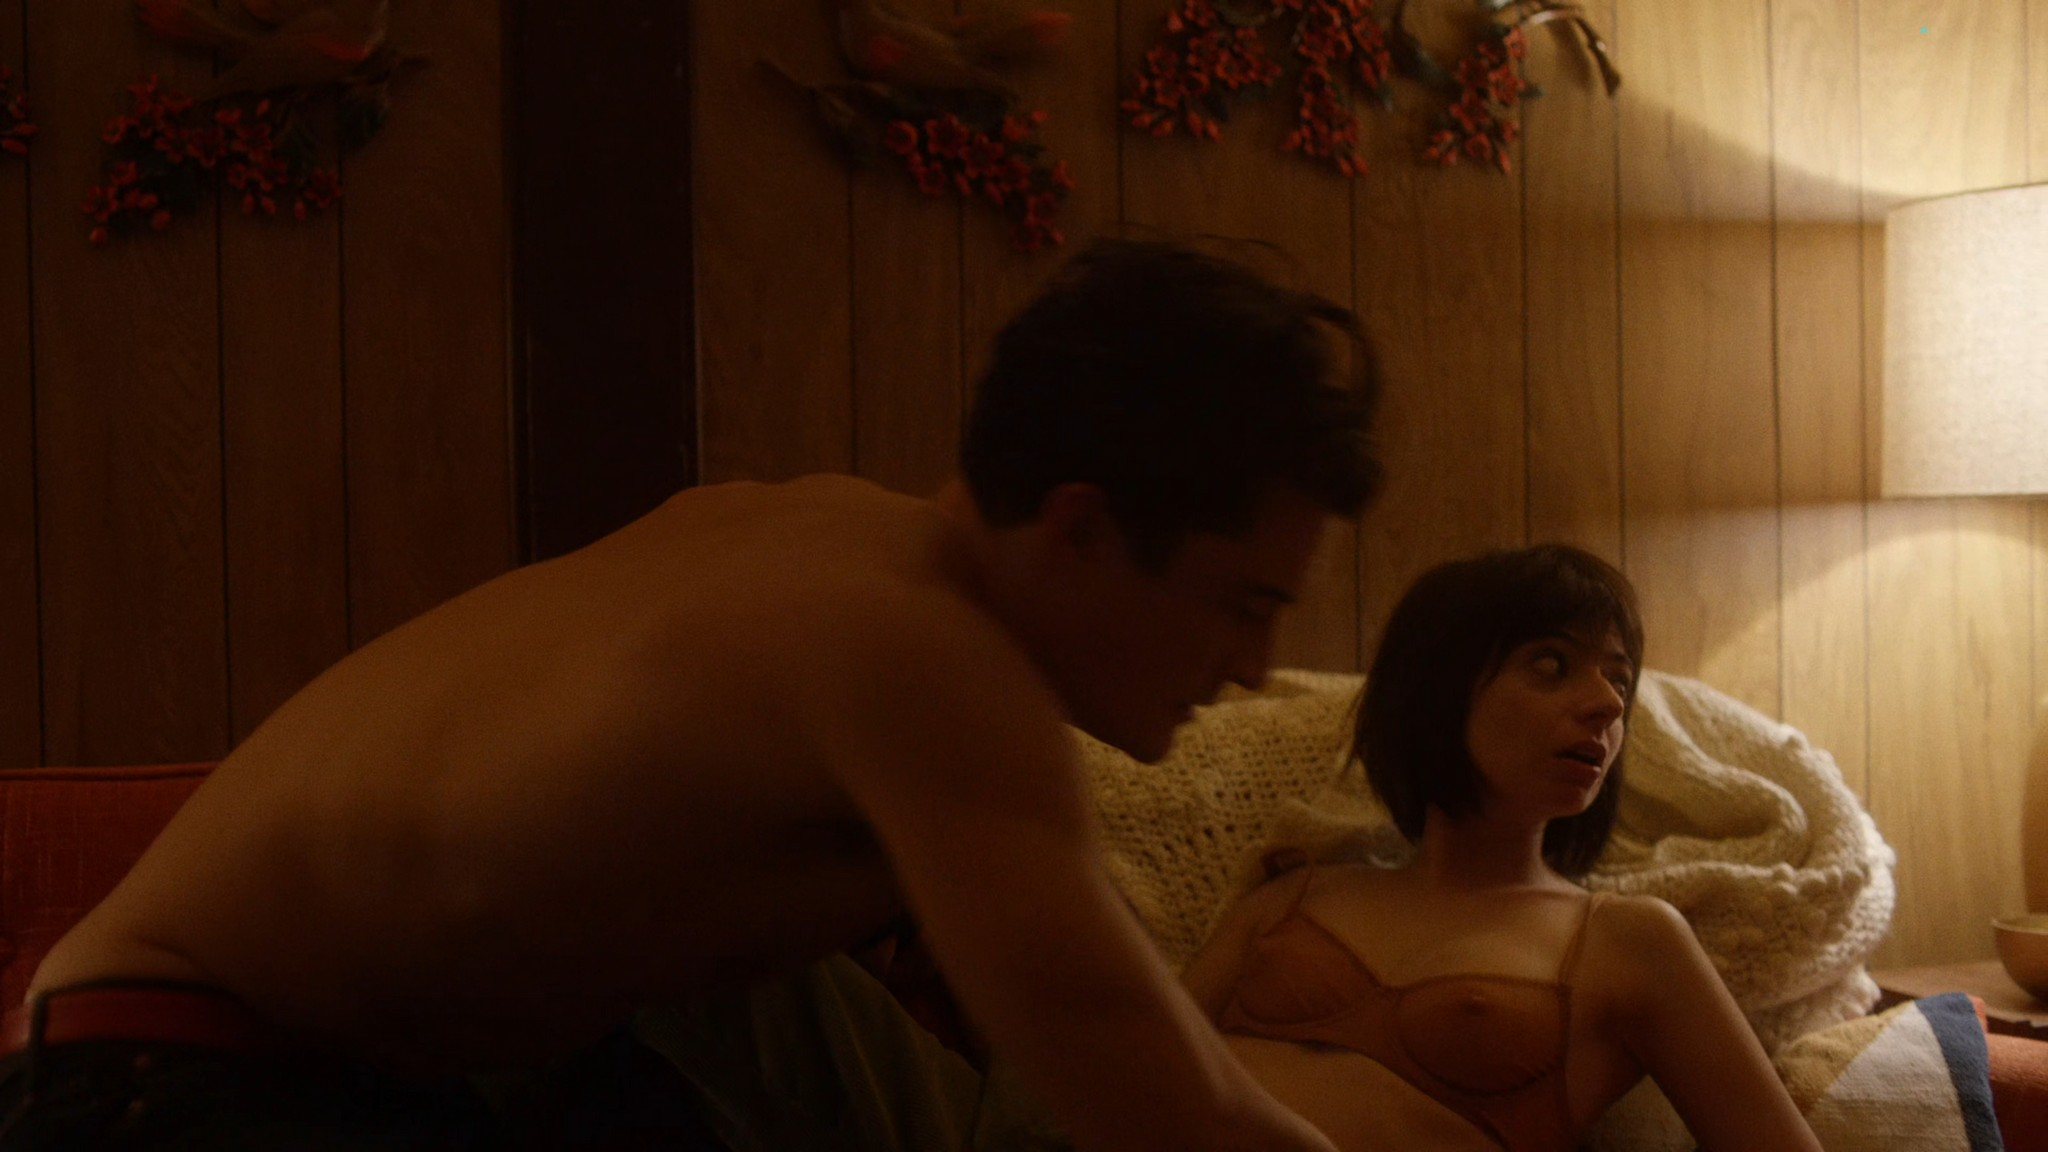 Malin Akerman nude sex threesome with Kate Micucci Easy 2016 s1e6 UHD 2160 1080p 002